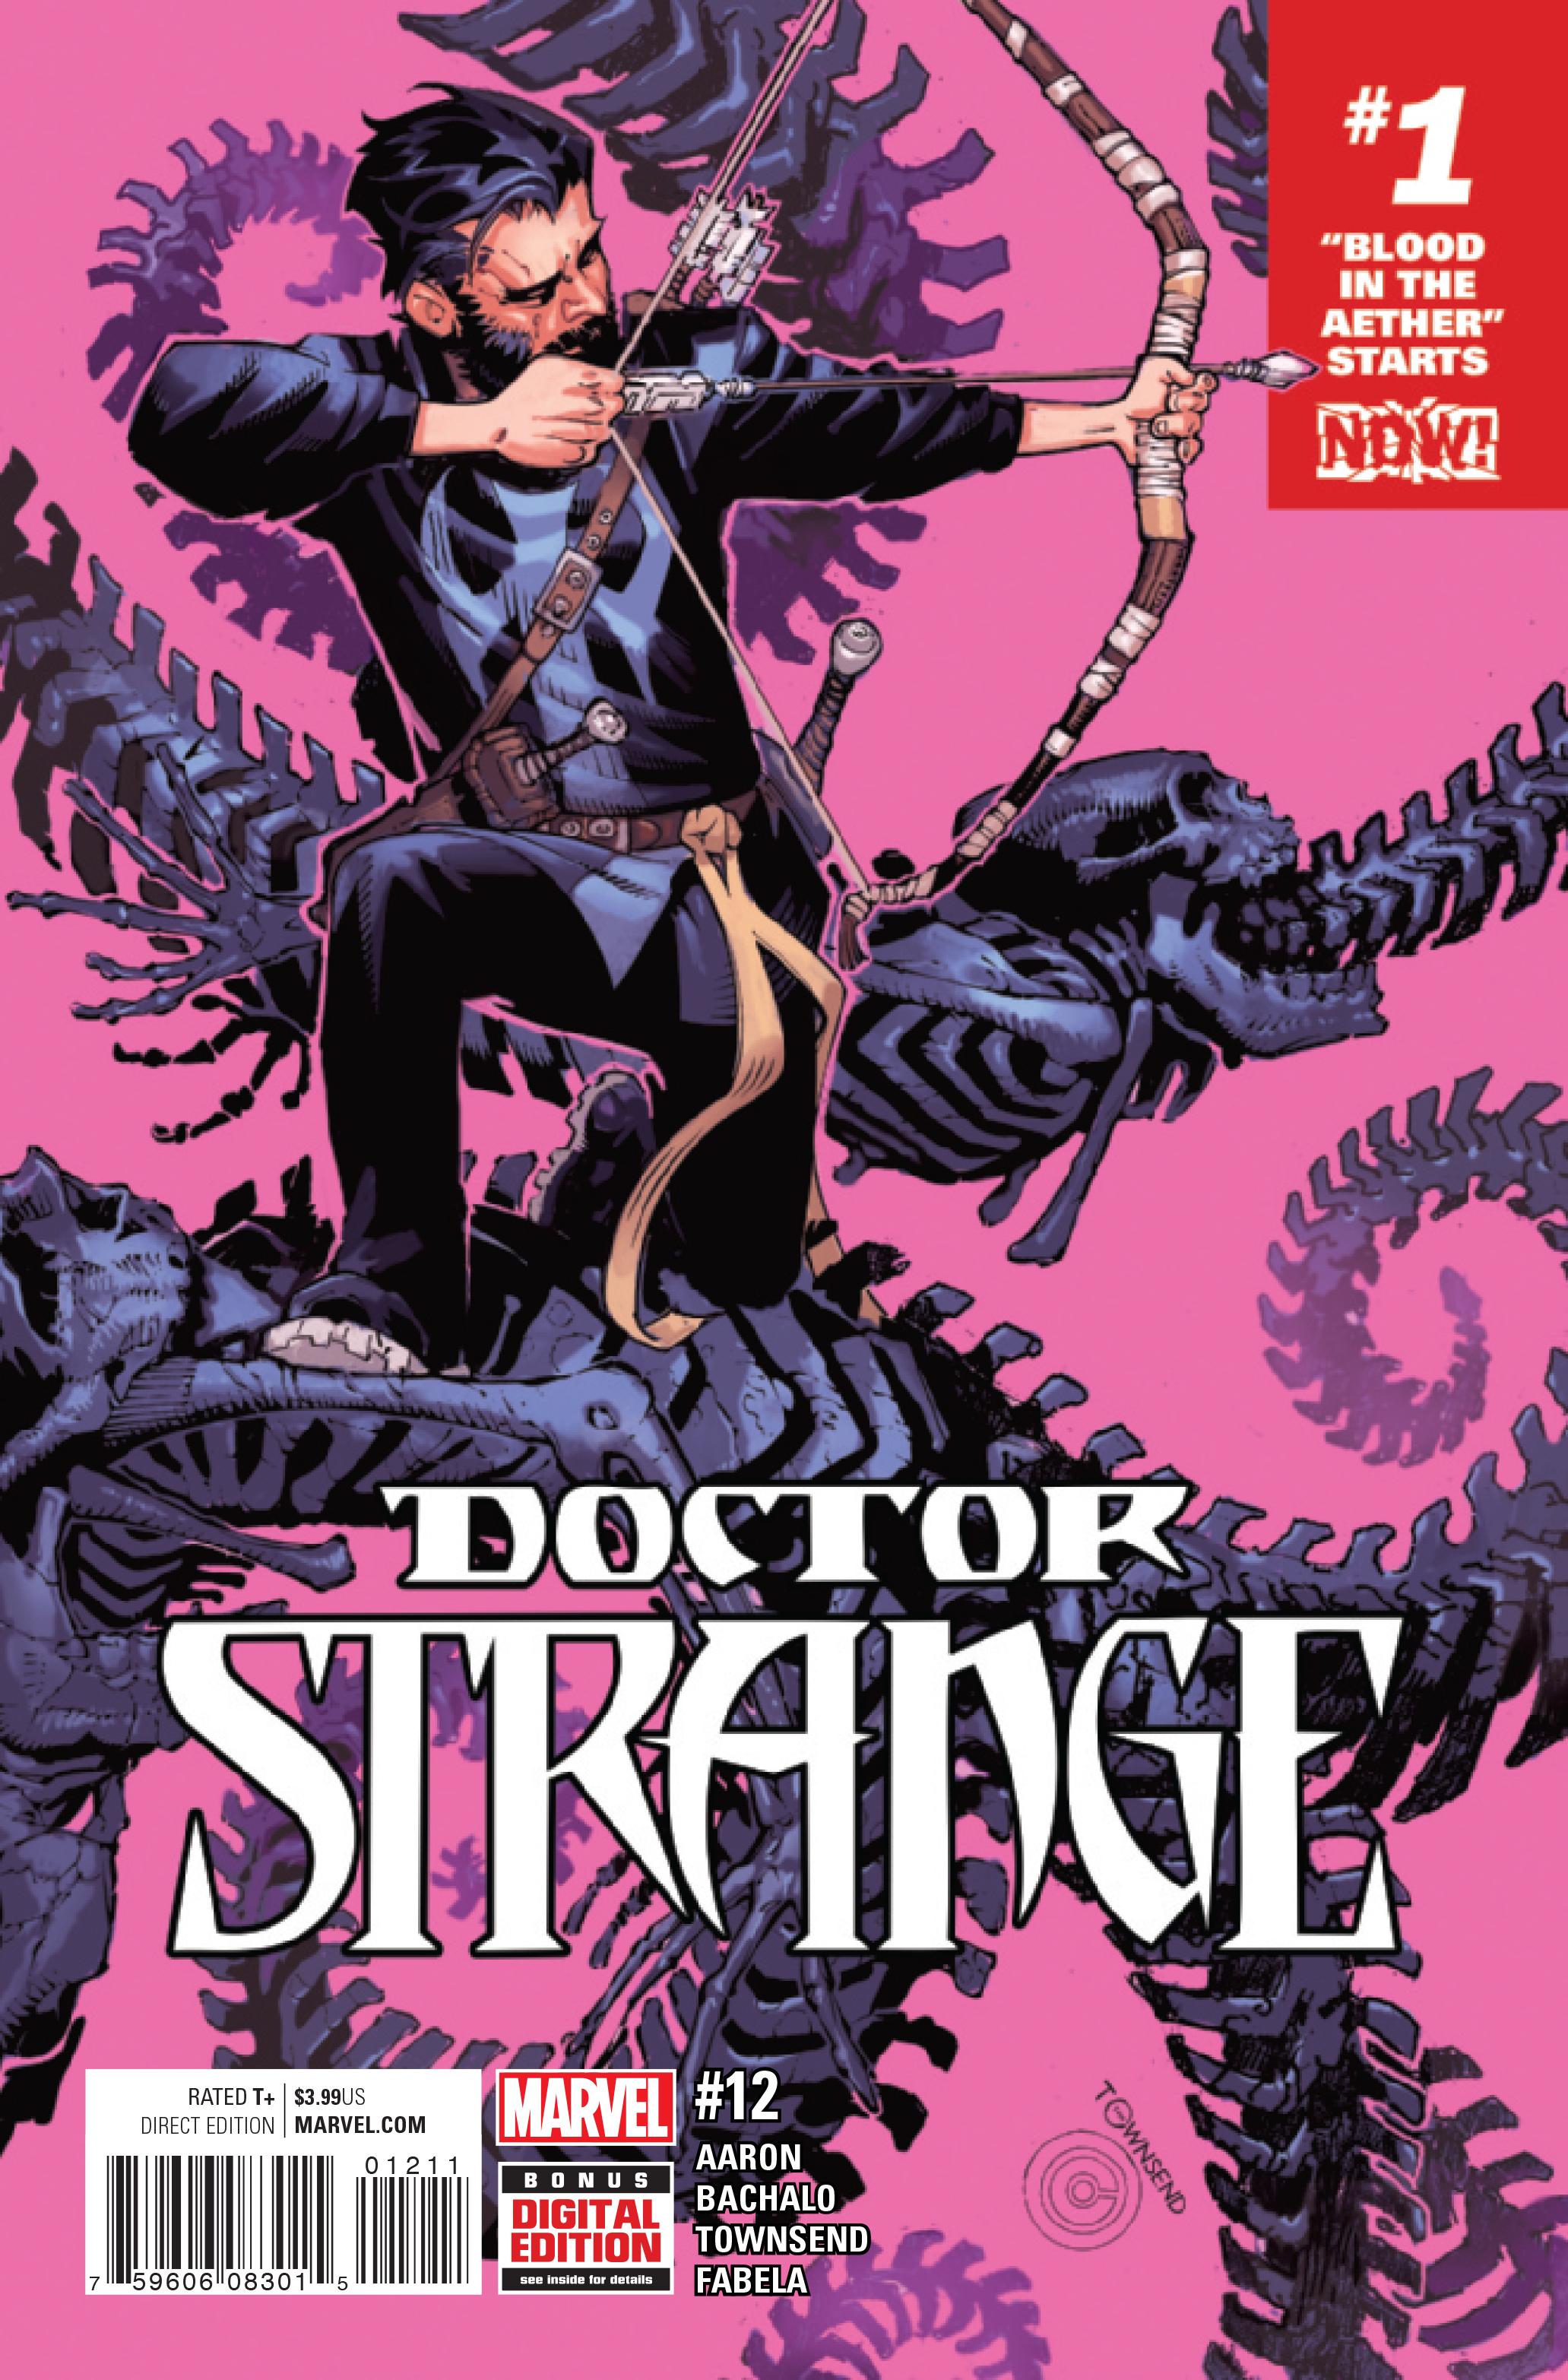 DOCTOR STRANGE #12 NOW